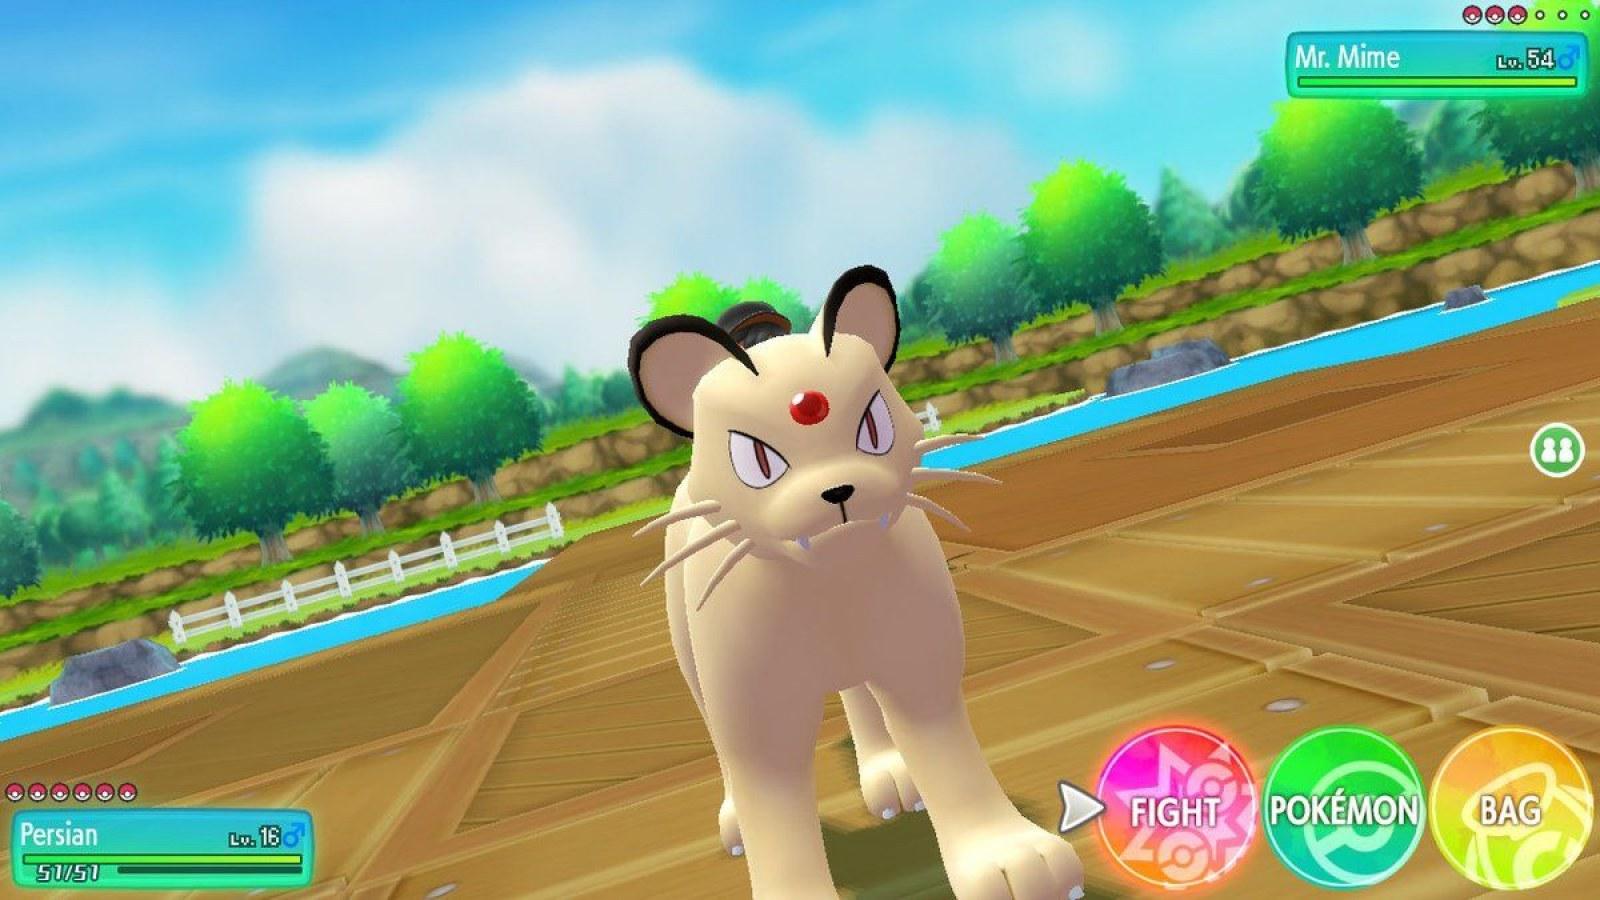 Pokémon Let's Go' Money Farm: Fastest Way to Earn PokeDollars